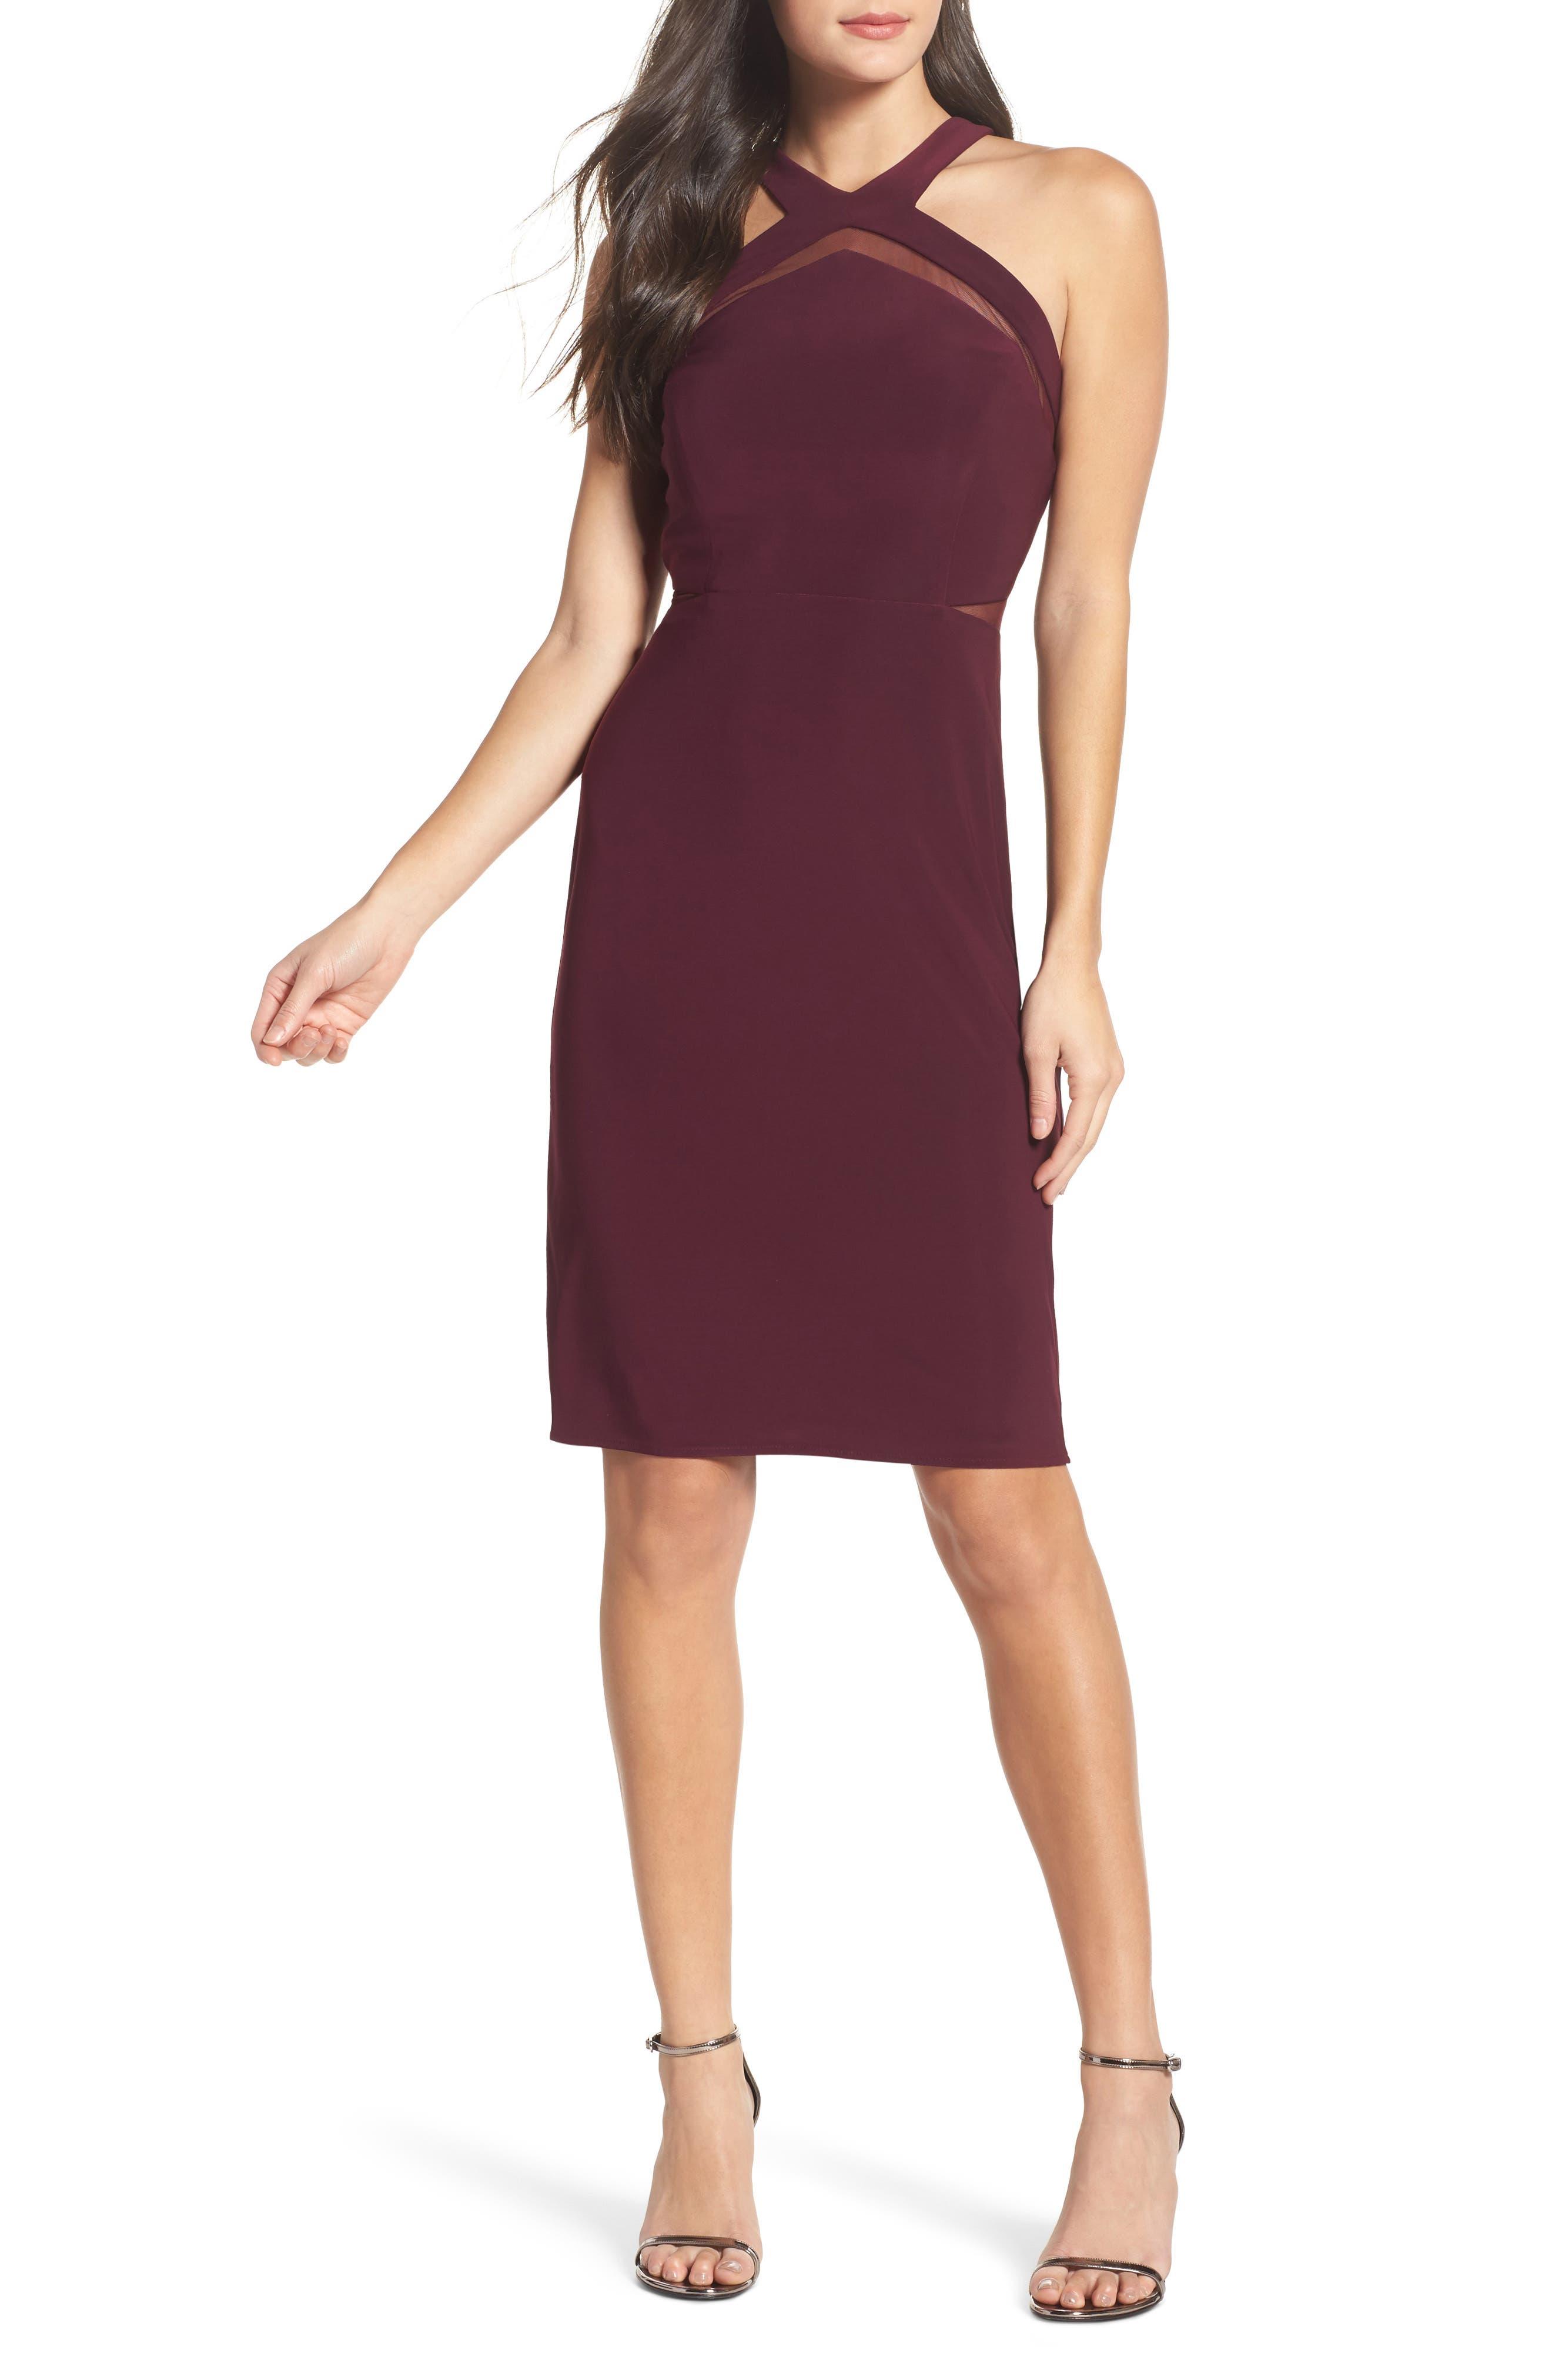 Alternate Image 1 Selected - Morgan & Co. Mesh Inset Sheath Dress